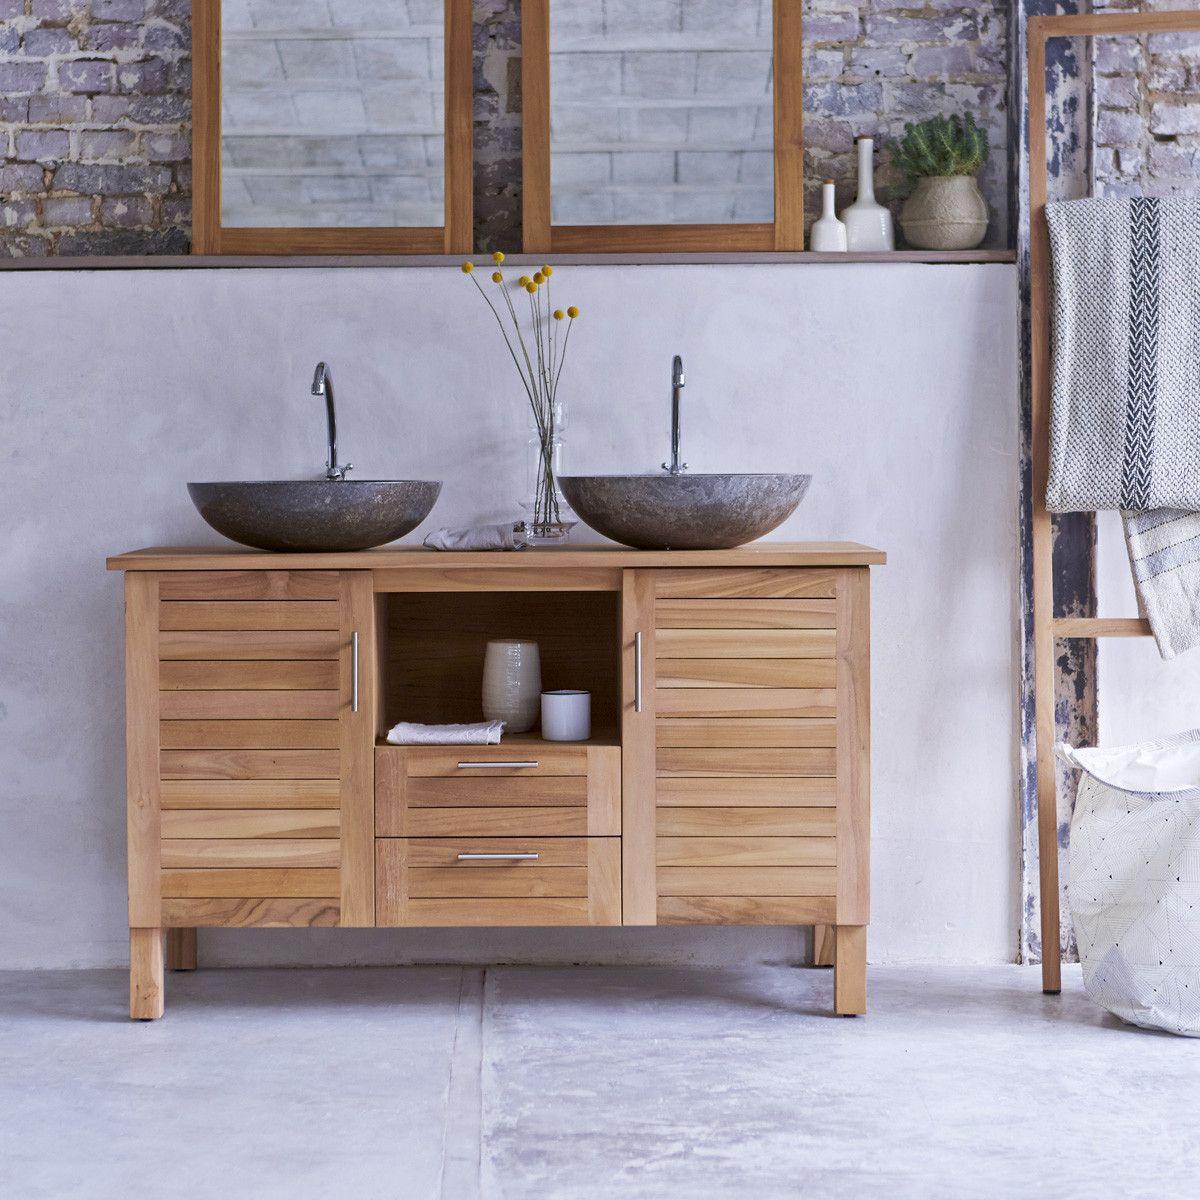 Badunterschrank aus Teak 125 Soho | Sonstiges | Pinterest | Badideen ...